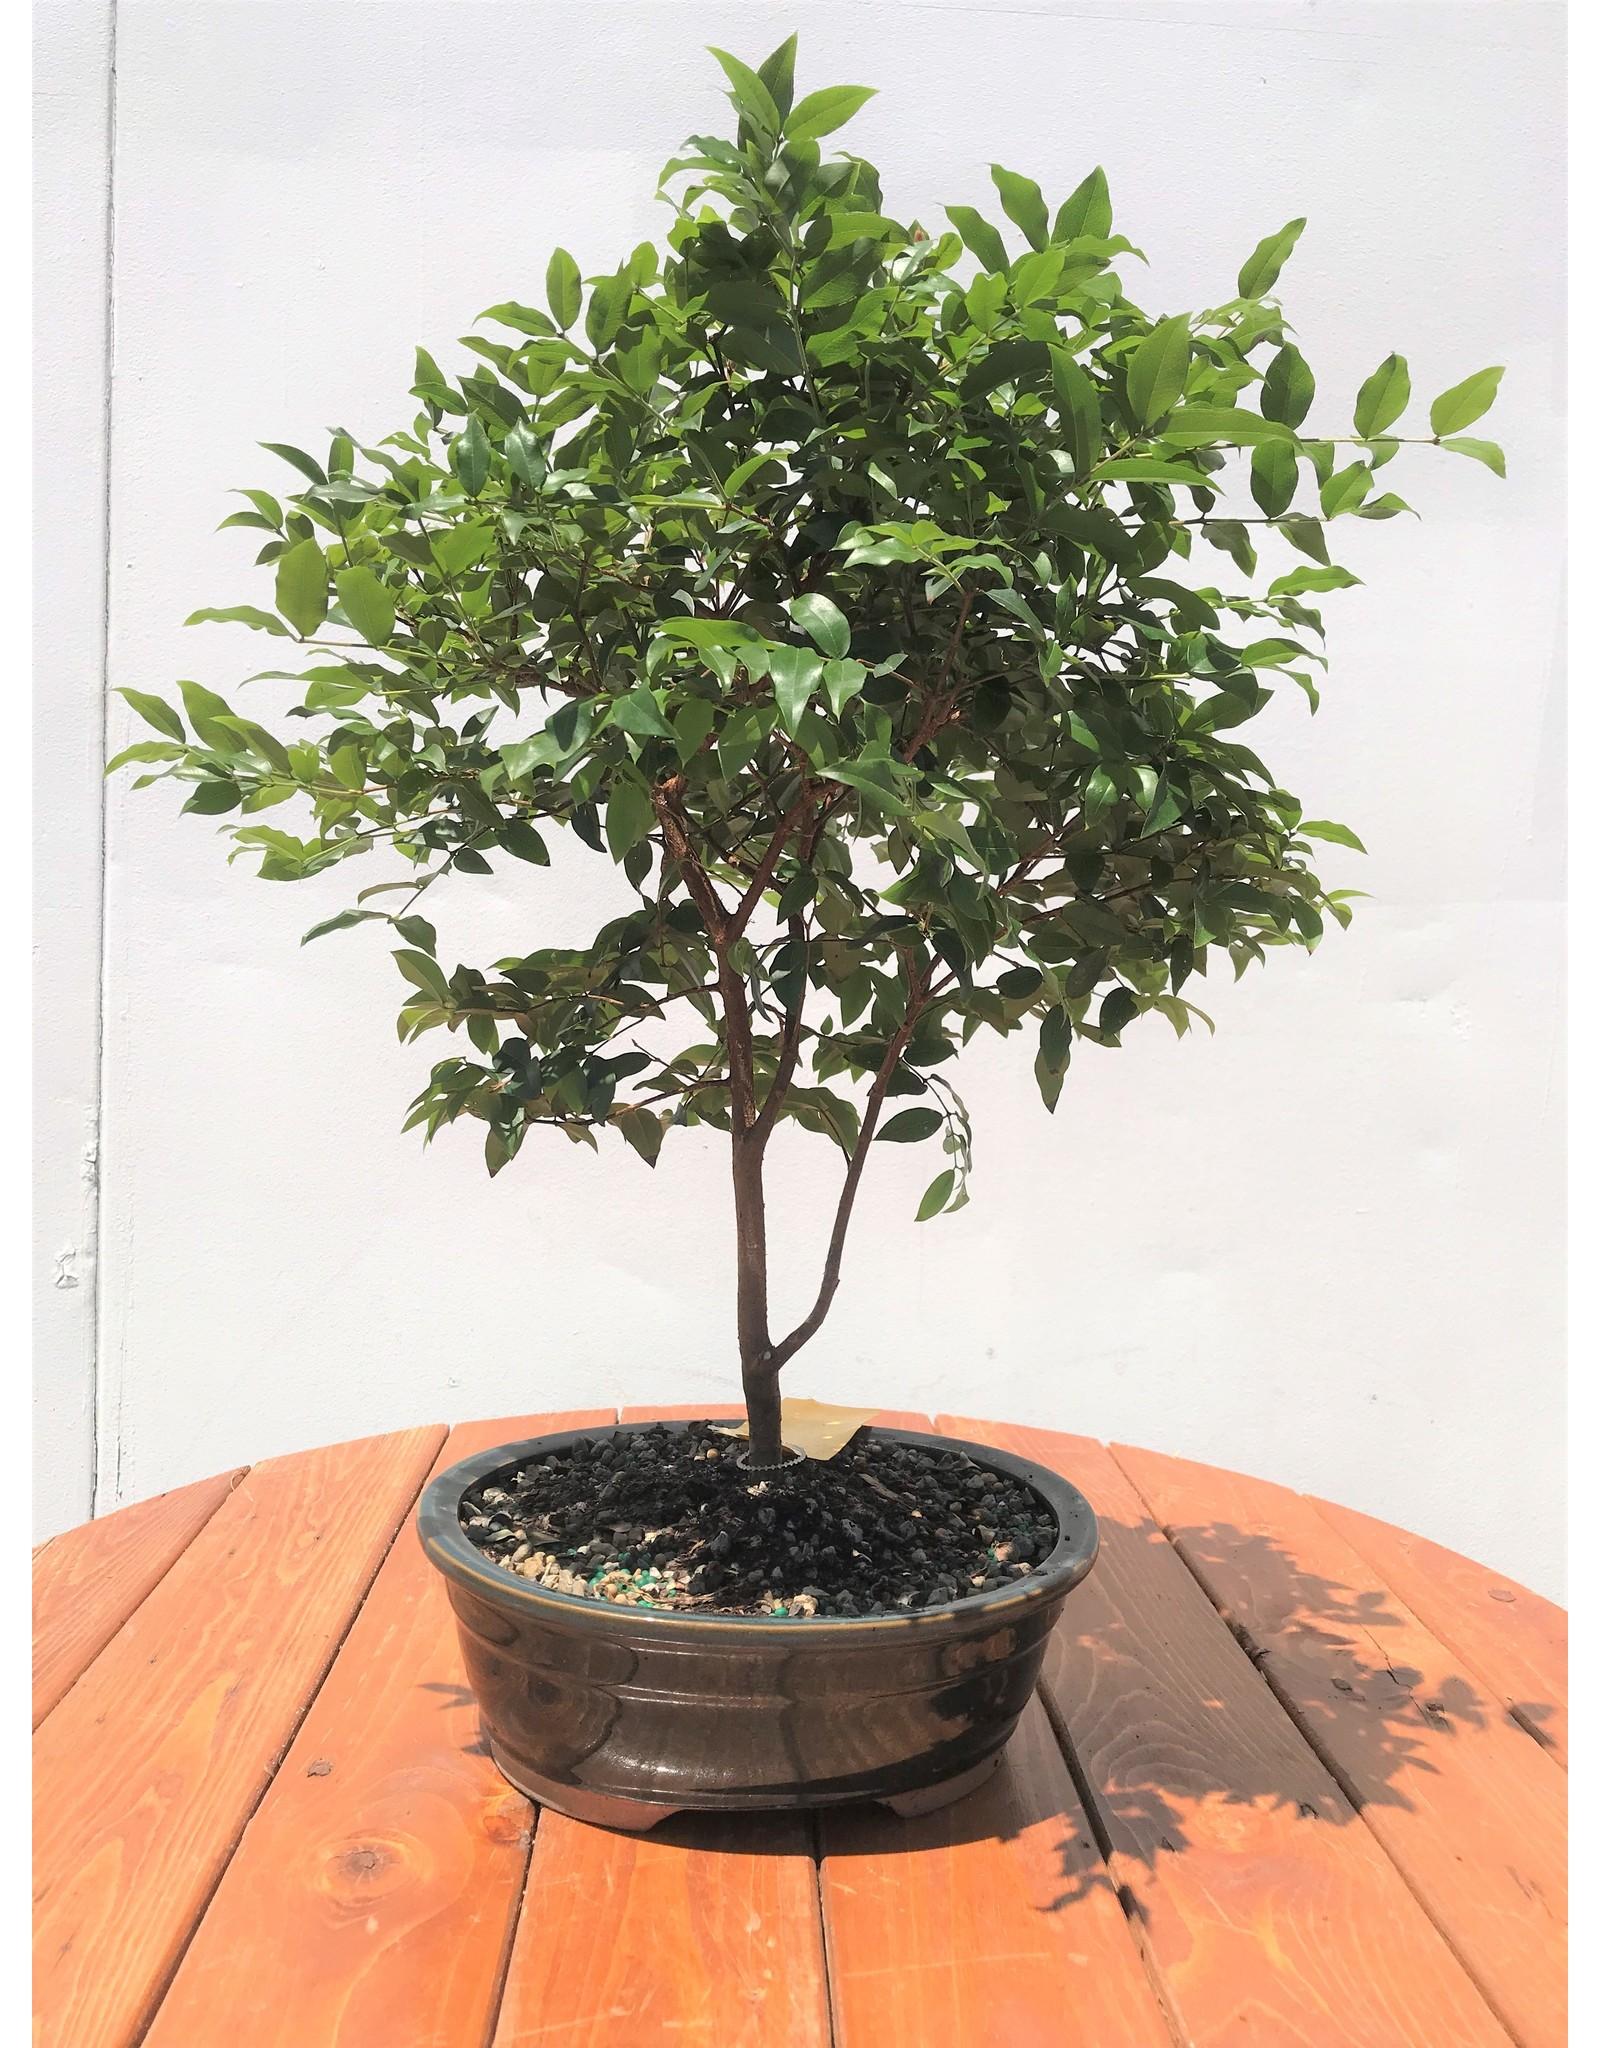 Bonsai, Jaboticaba - Plinia Cauliflora - Large